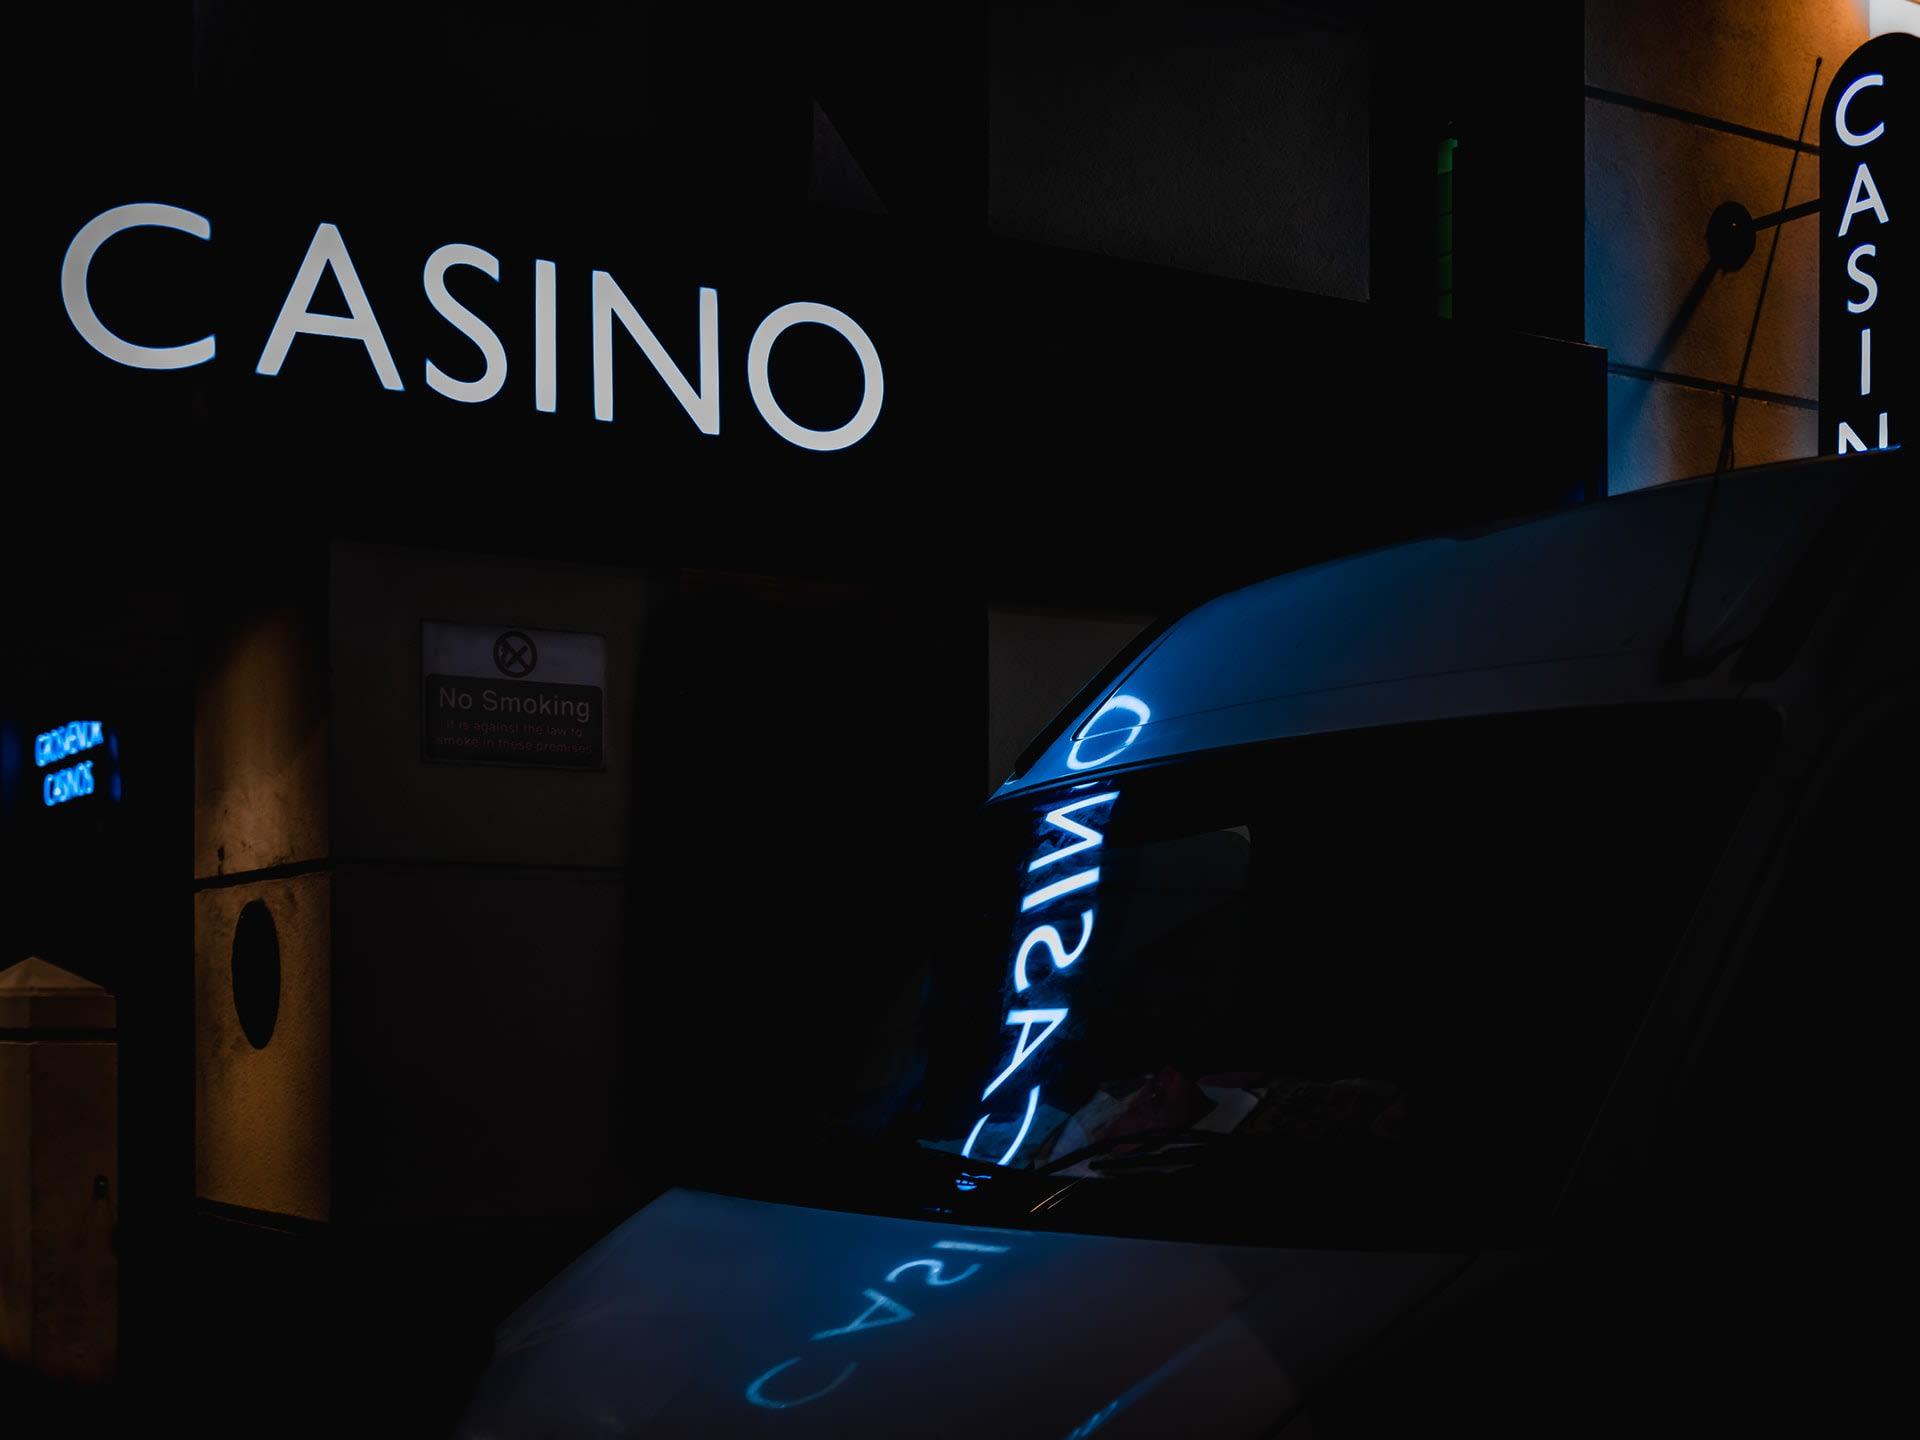 Online Casino vs. Casino Real | Razões para jogar online